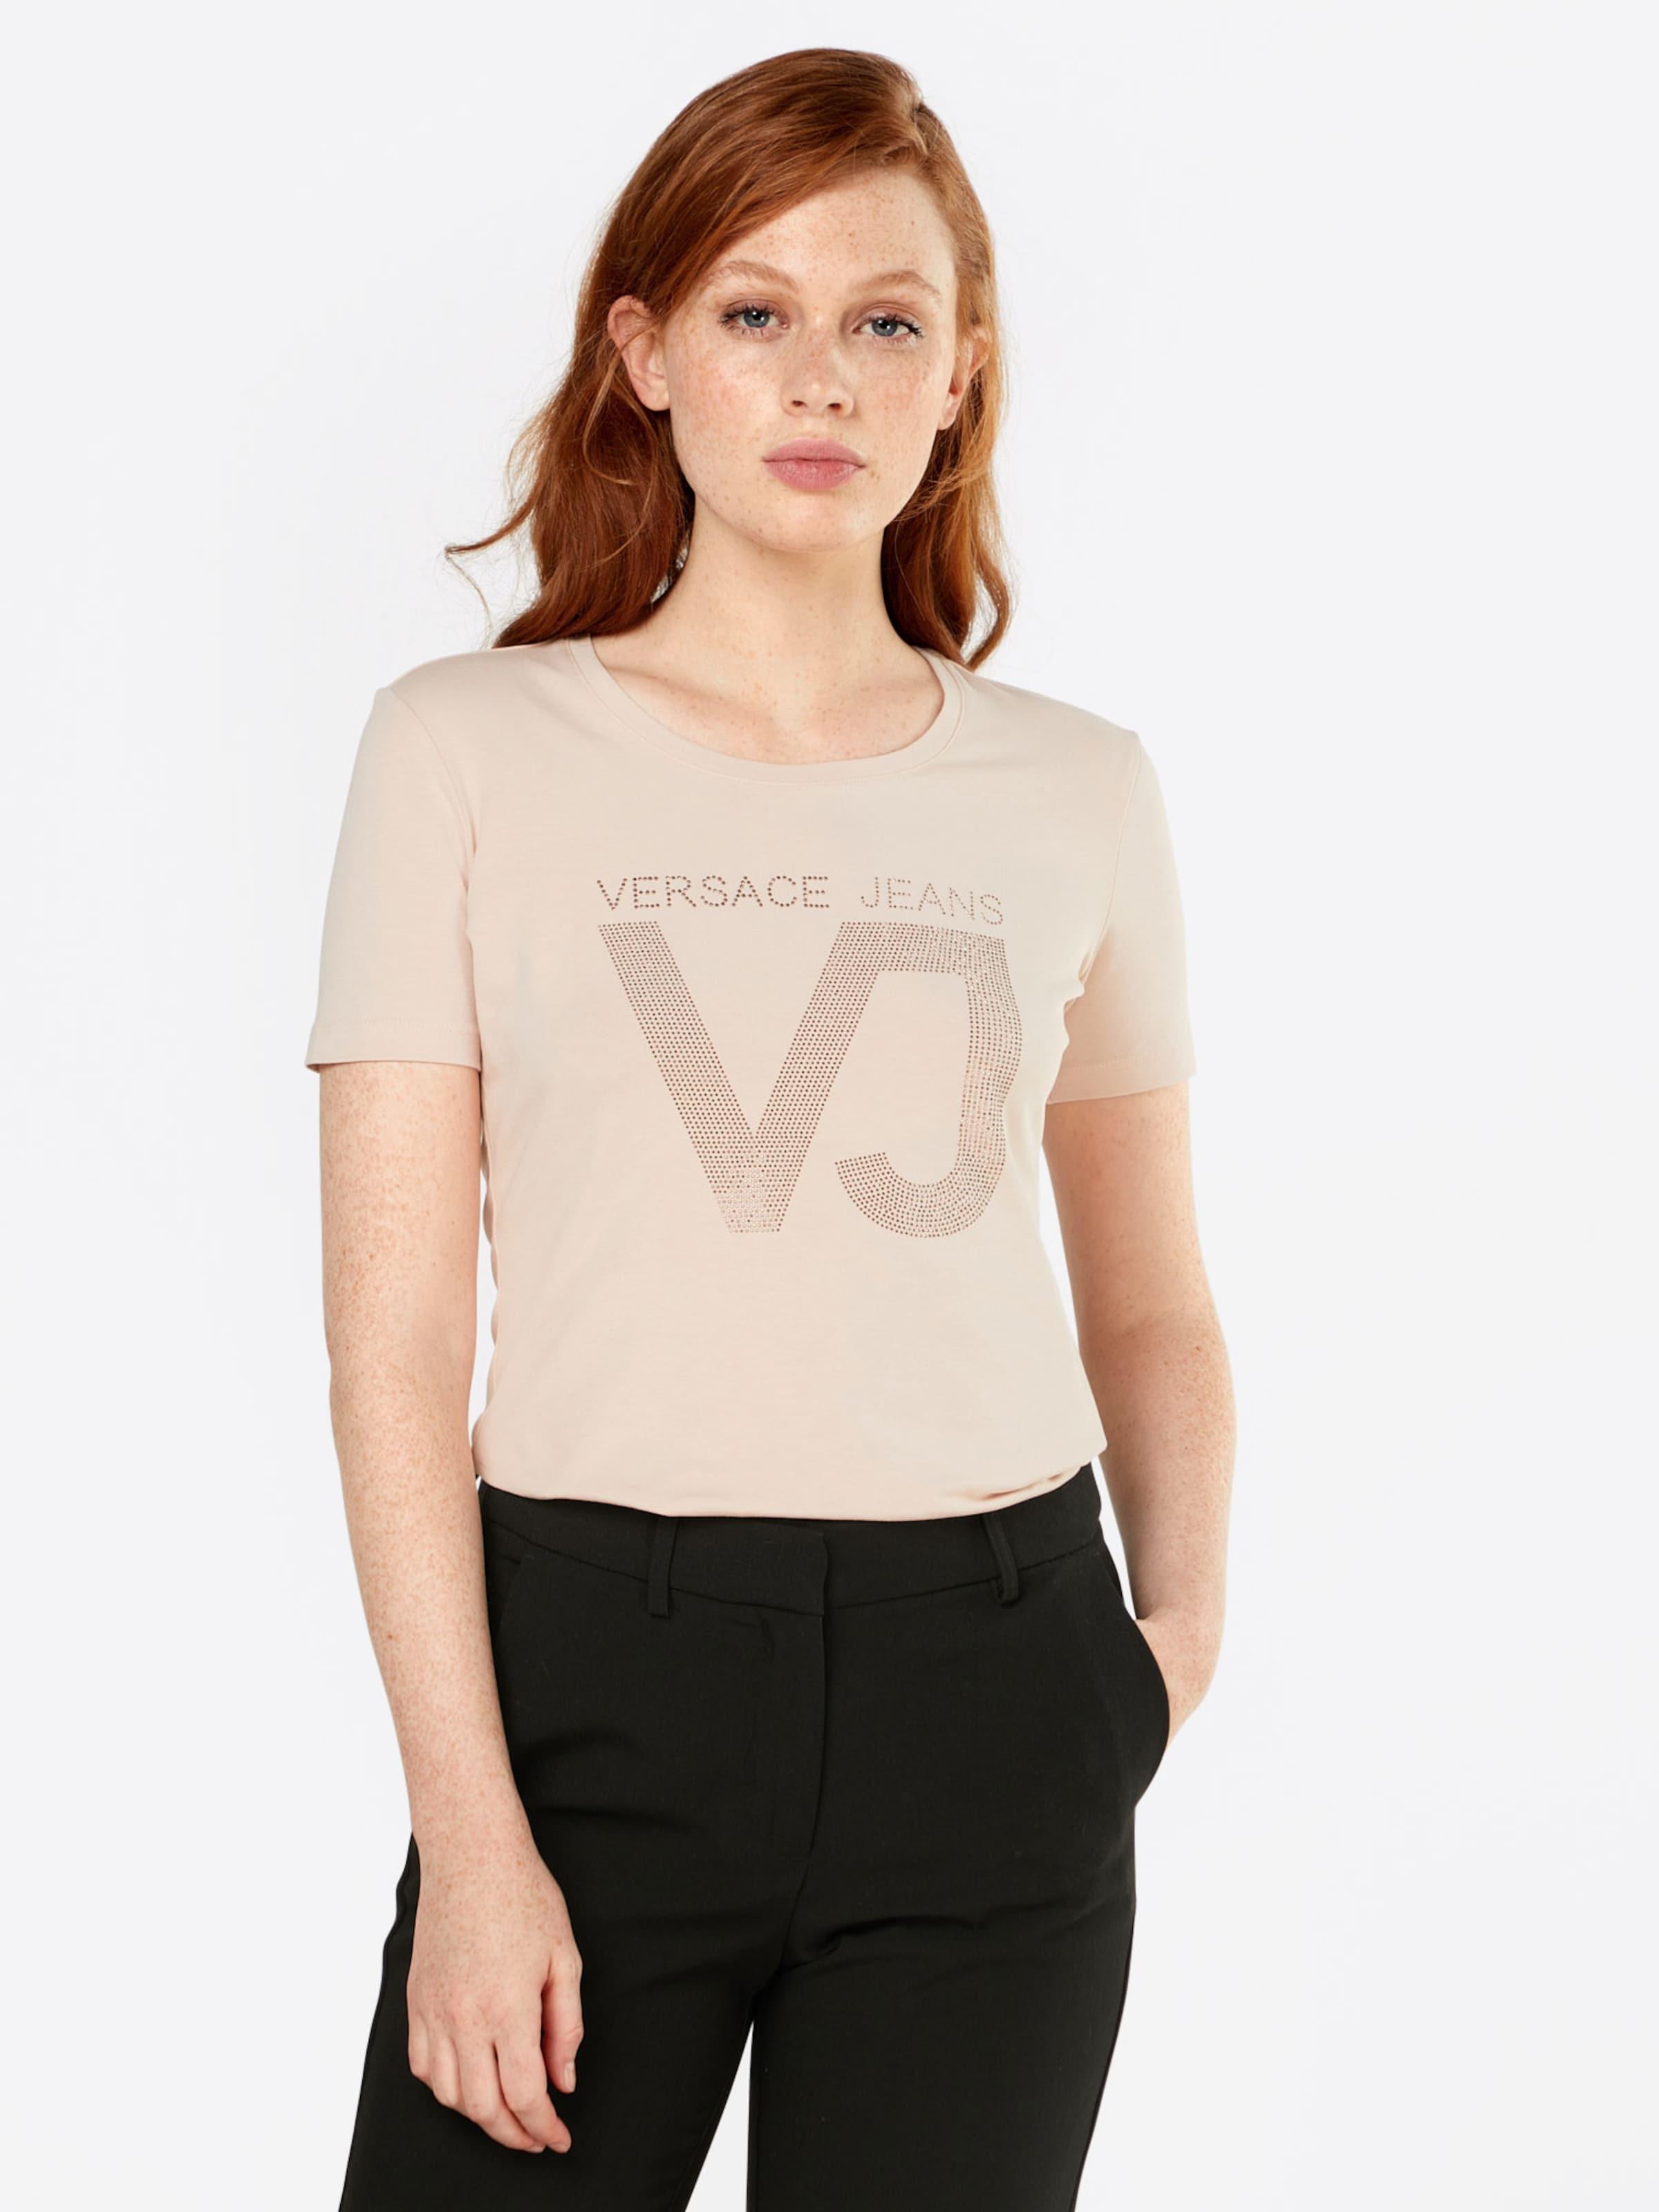 Auslass Wahl Billig Zu Kaufen Versace Jeans T-Shirt 'RDM606 45VJ' Auslass Empfehlen Original Günstiger Preis Neuer Stil XYlDD9